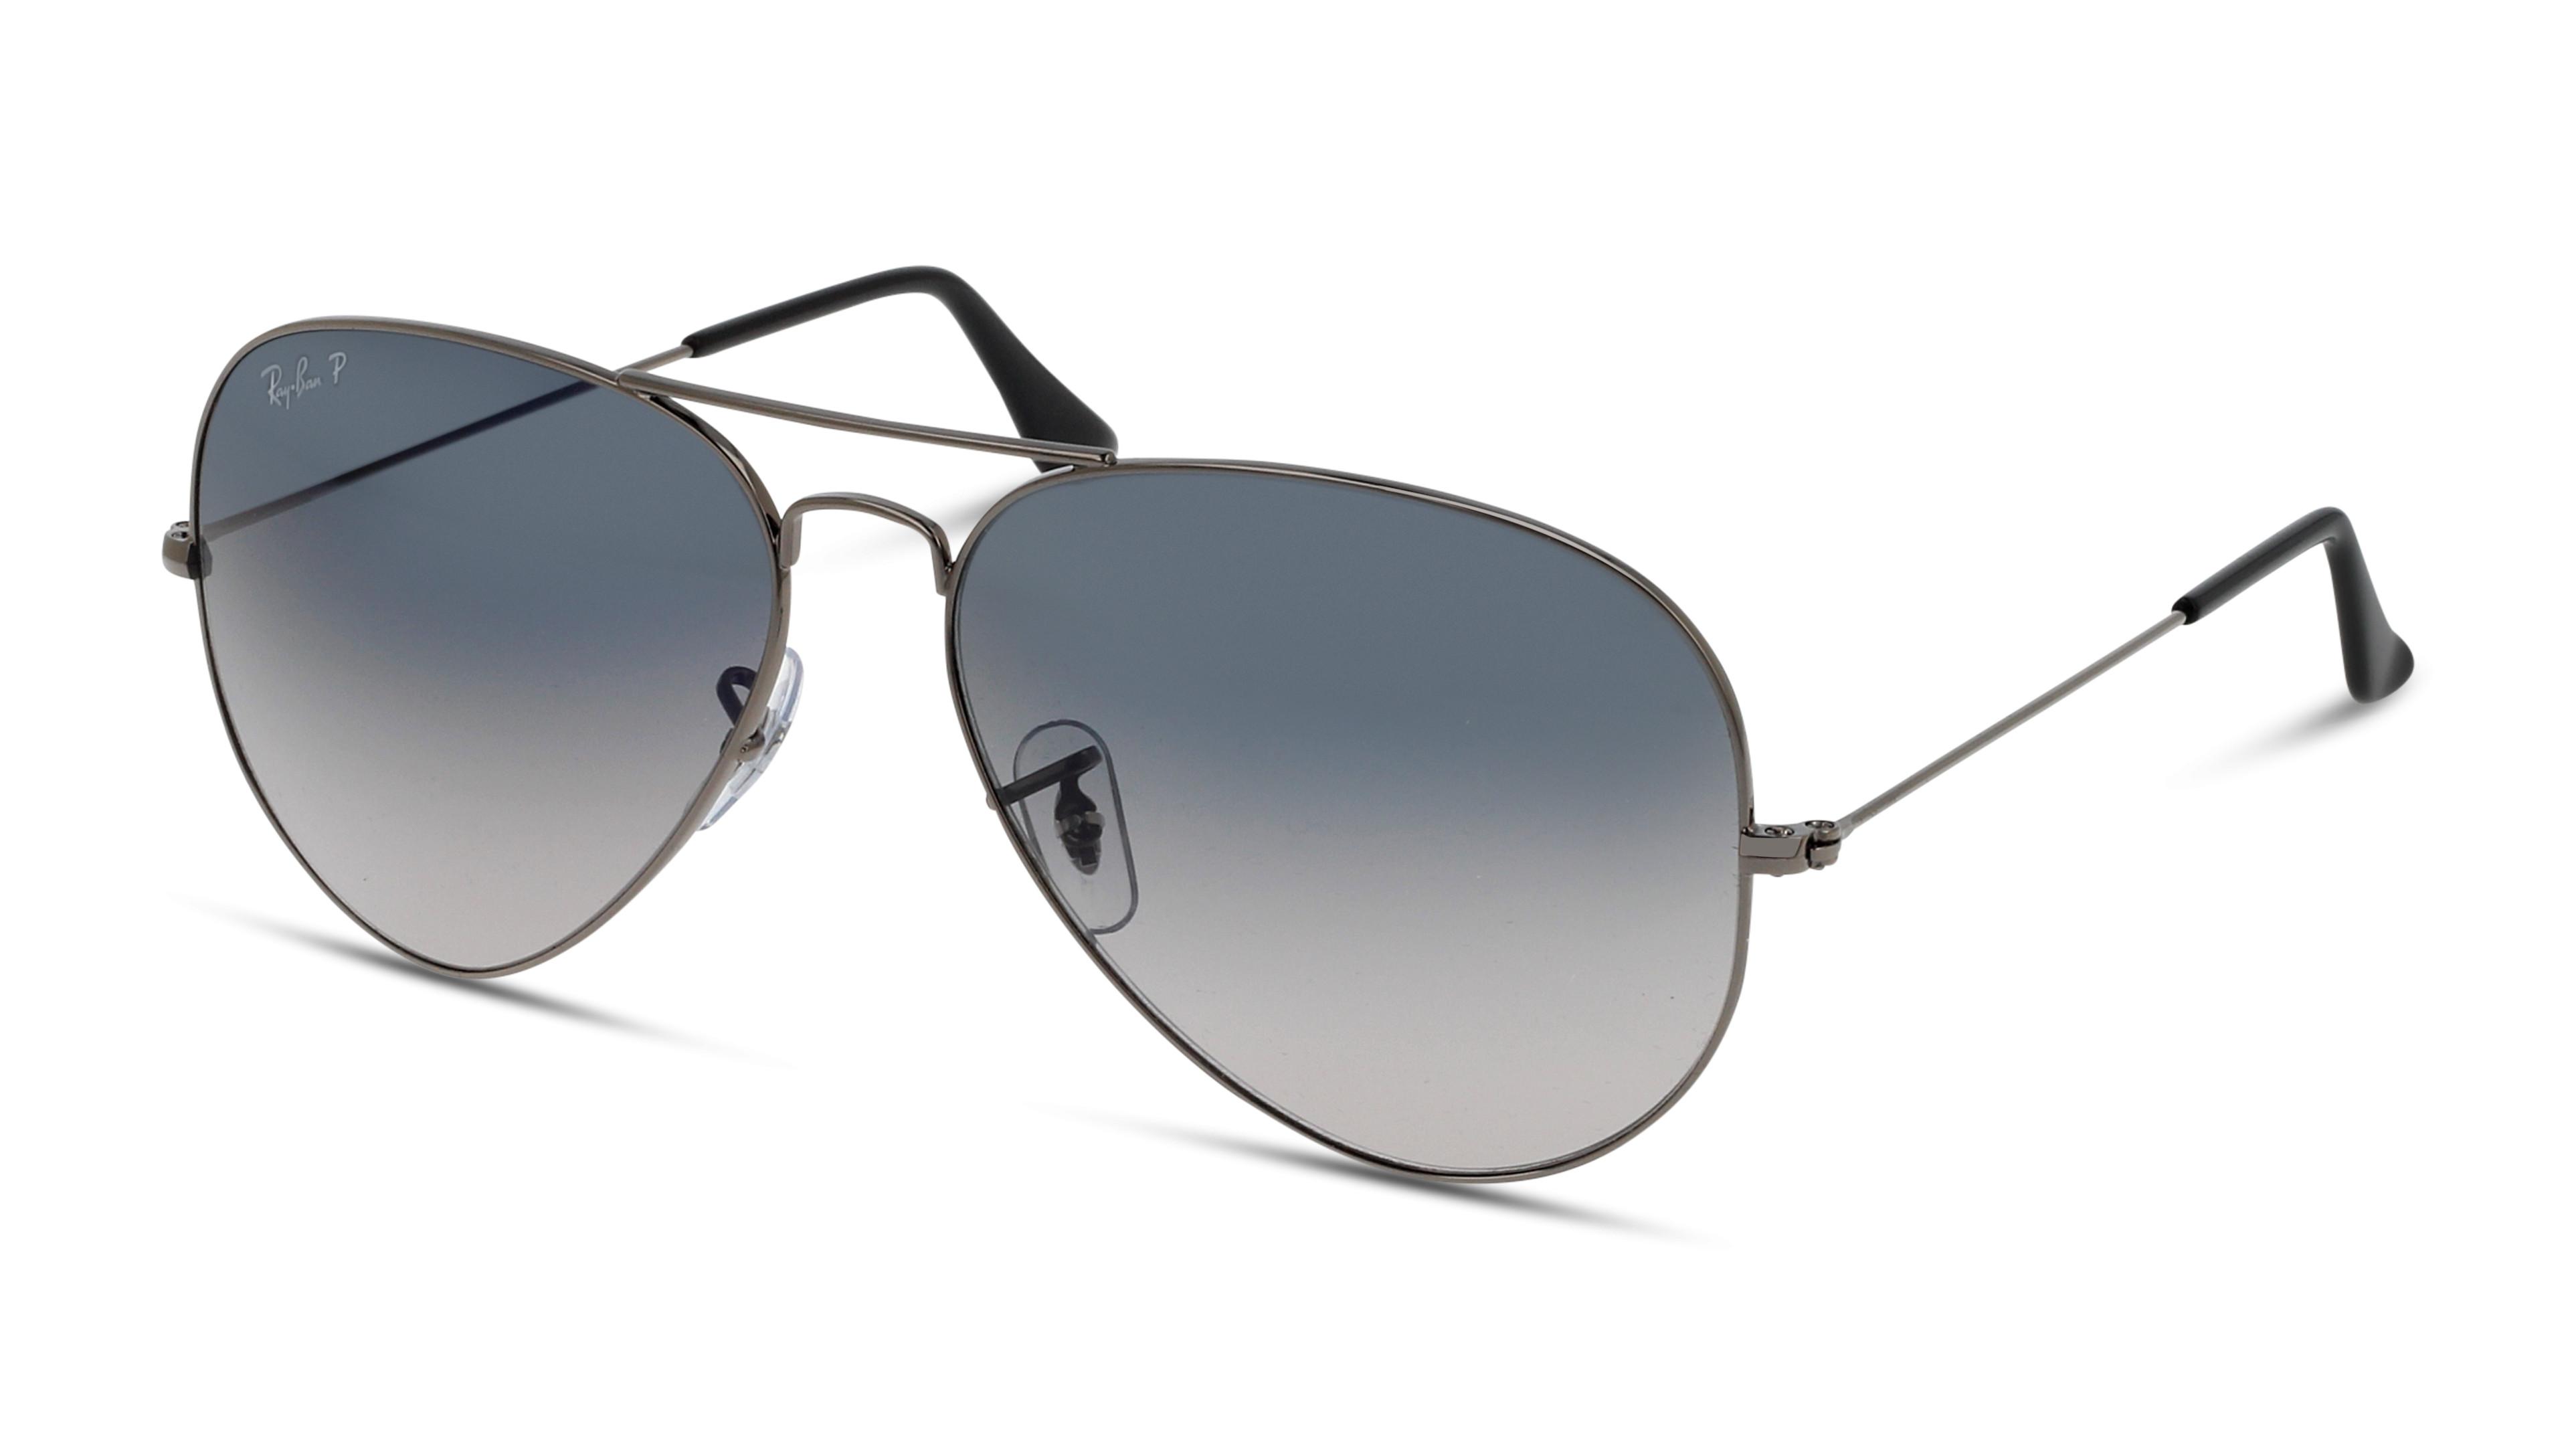 805289467069-angle-01-rayban-glasses-eyewear-pair